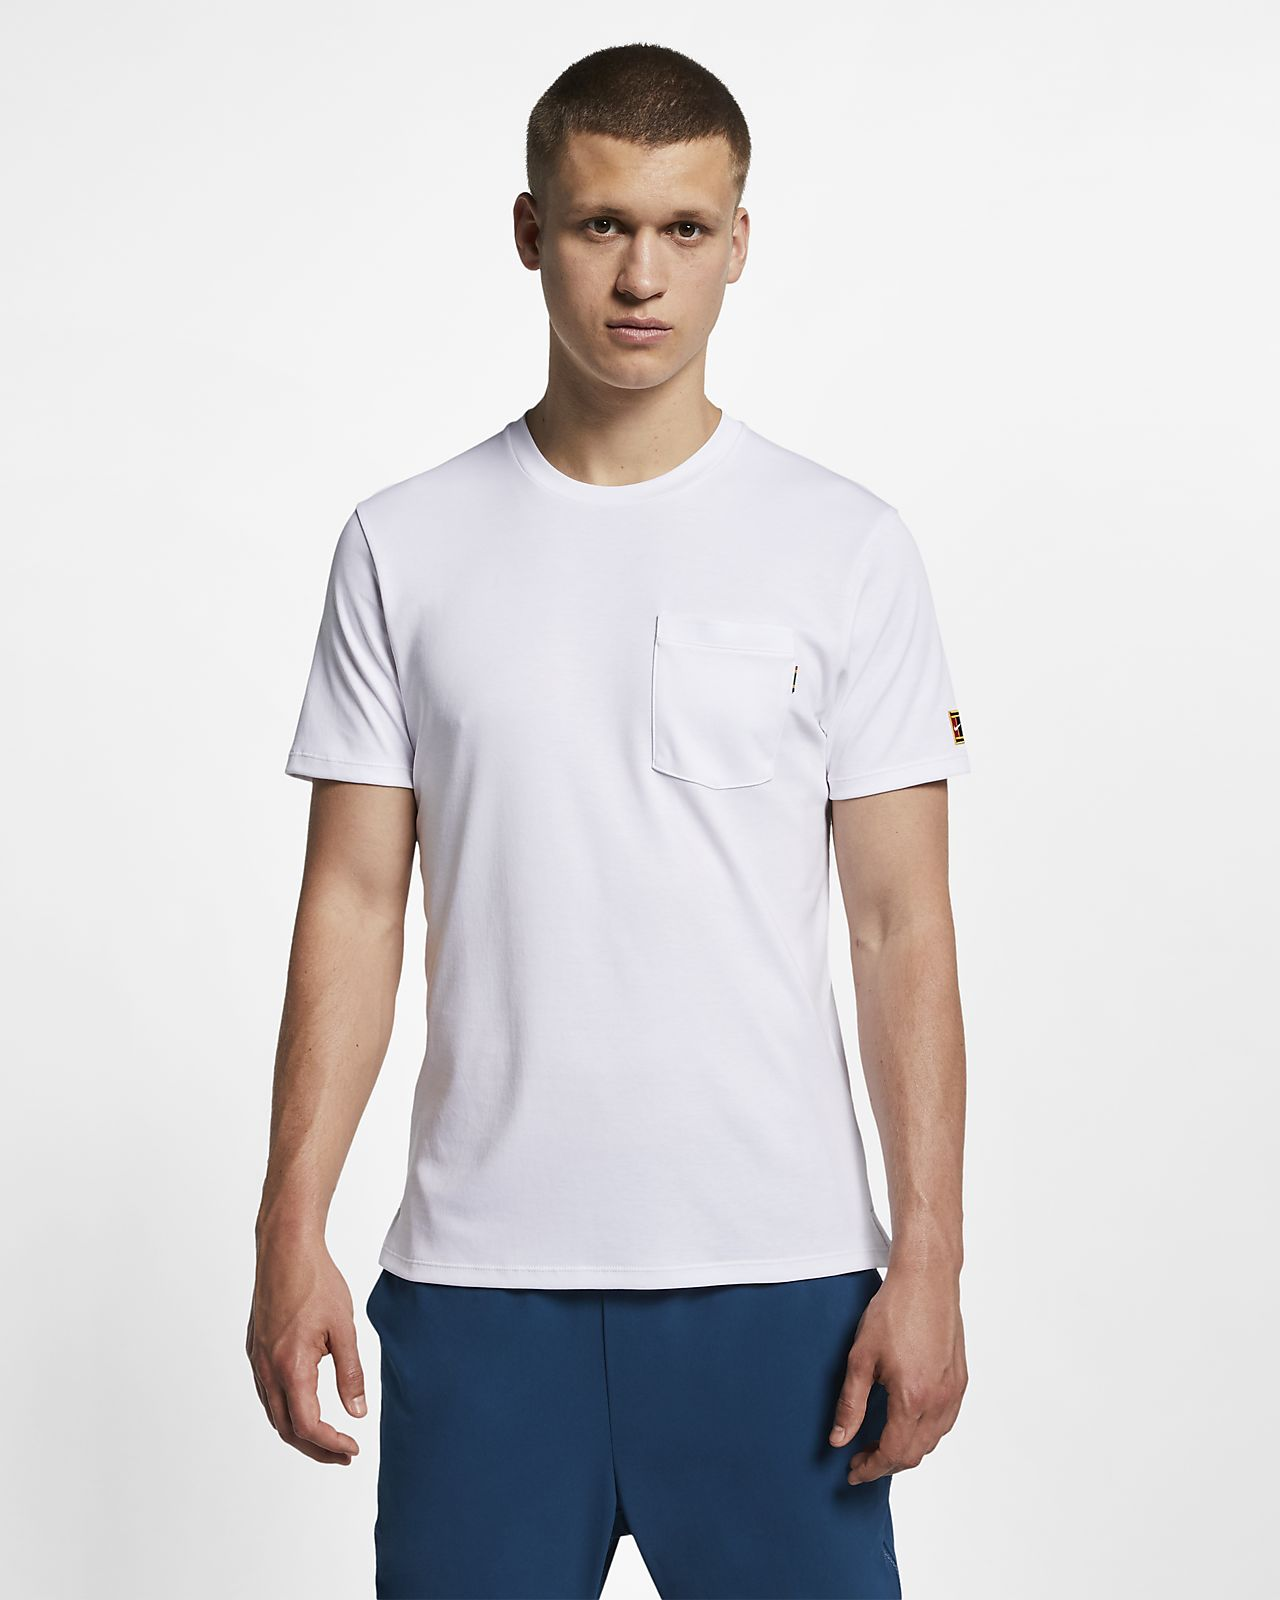 NikeCourt Men's Short-Sleeve Tennis Top